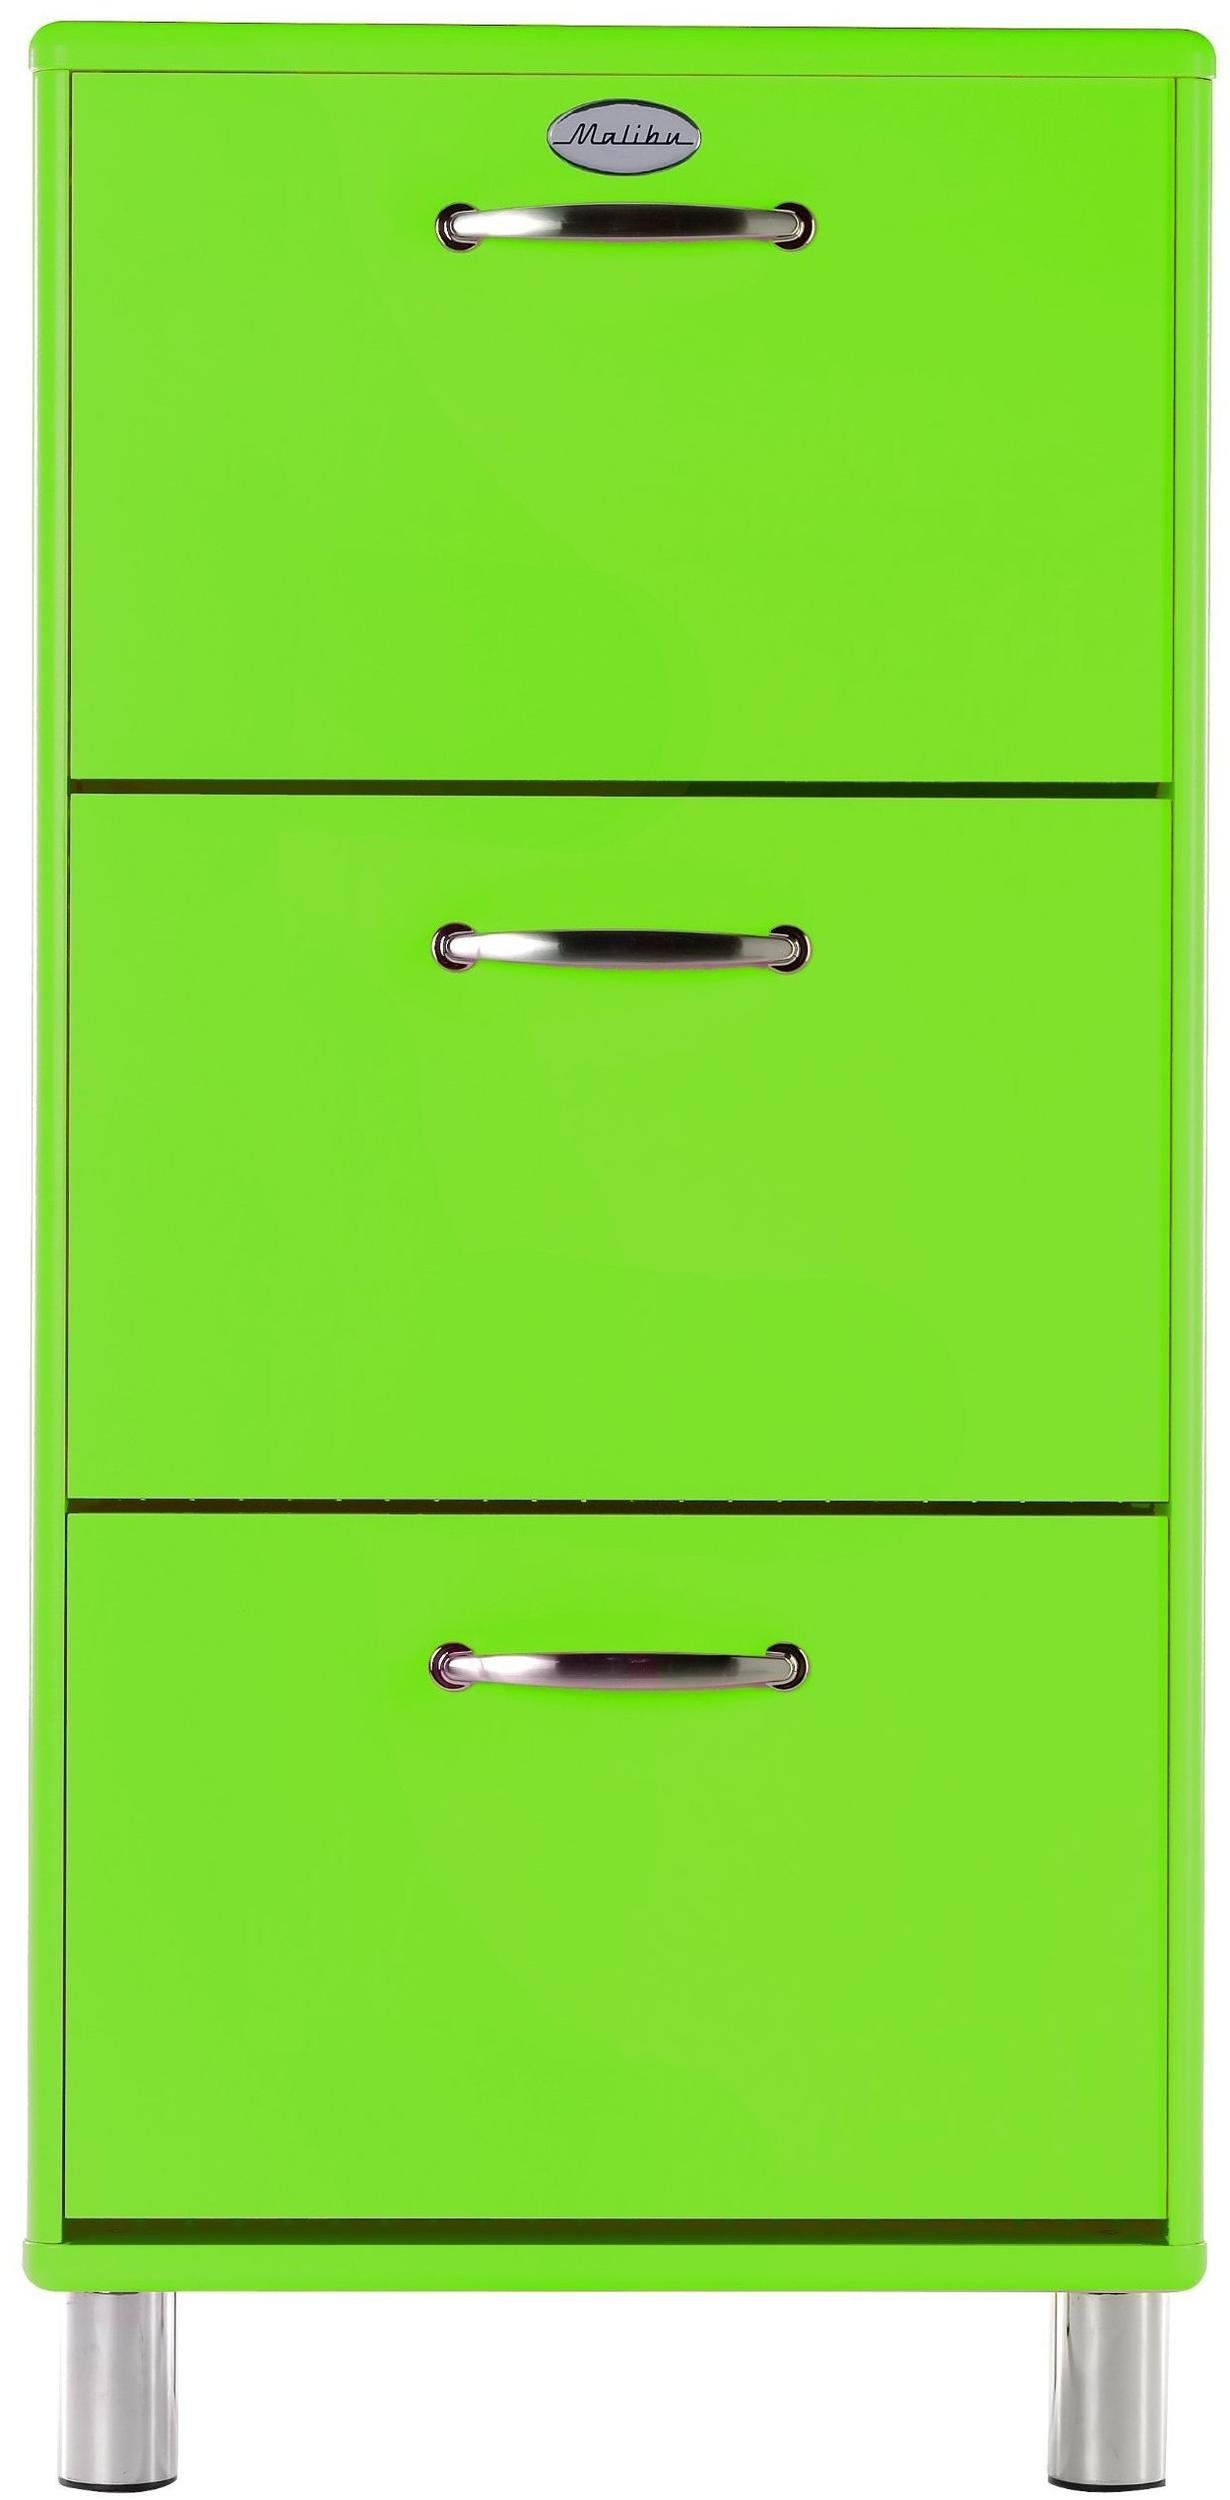 Tenzo Malibu Schuhschrank 58 cm grün (3 Kippfächer) Test Weitere ...